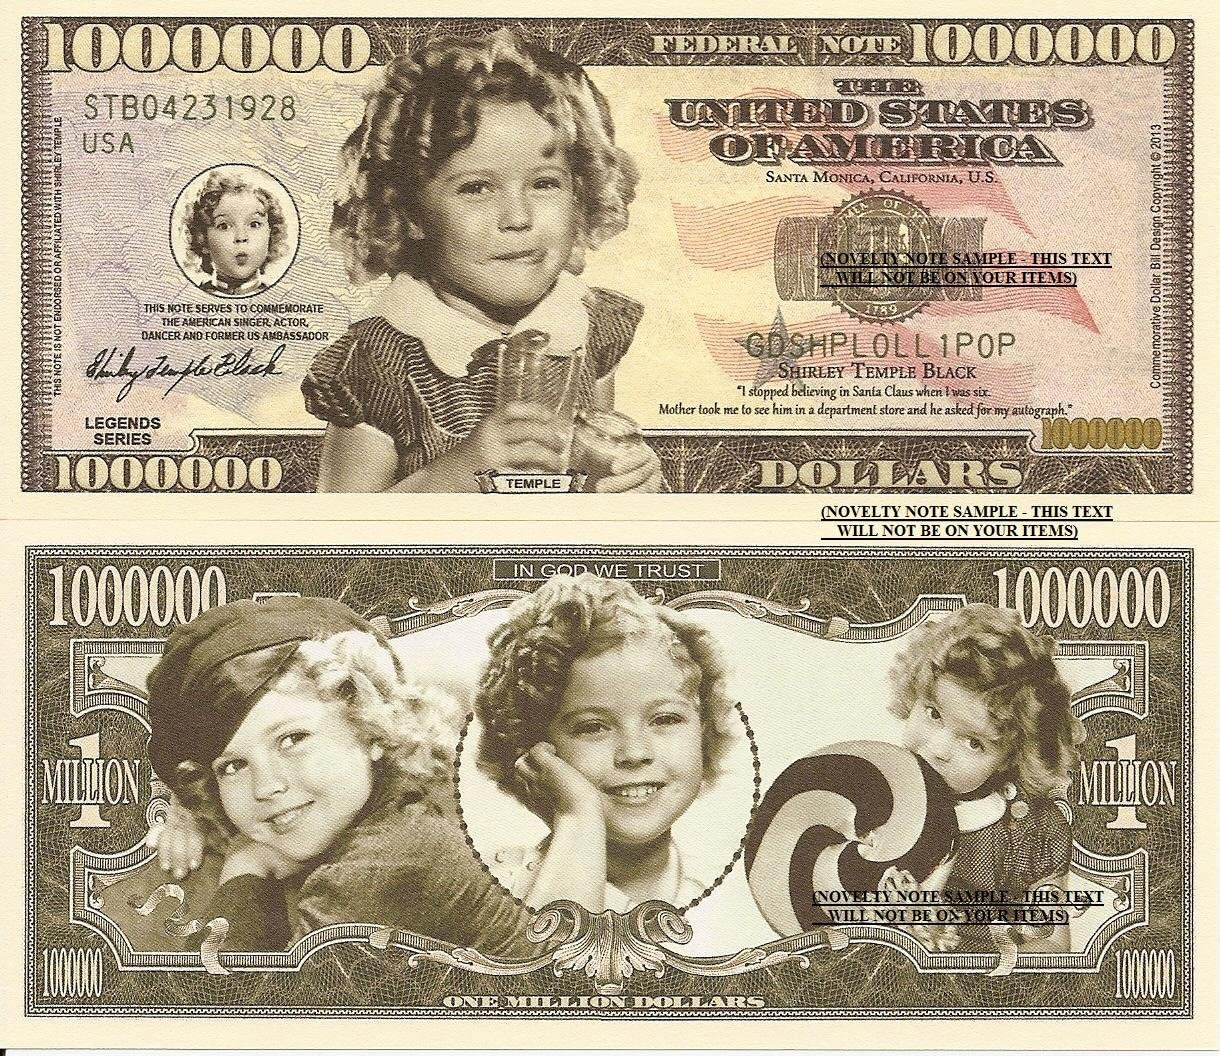 Novelty Dollar Shirley Temple Black Commemorative Million Dollar Bills x 2 American Singer Actor